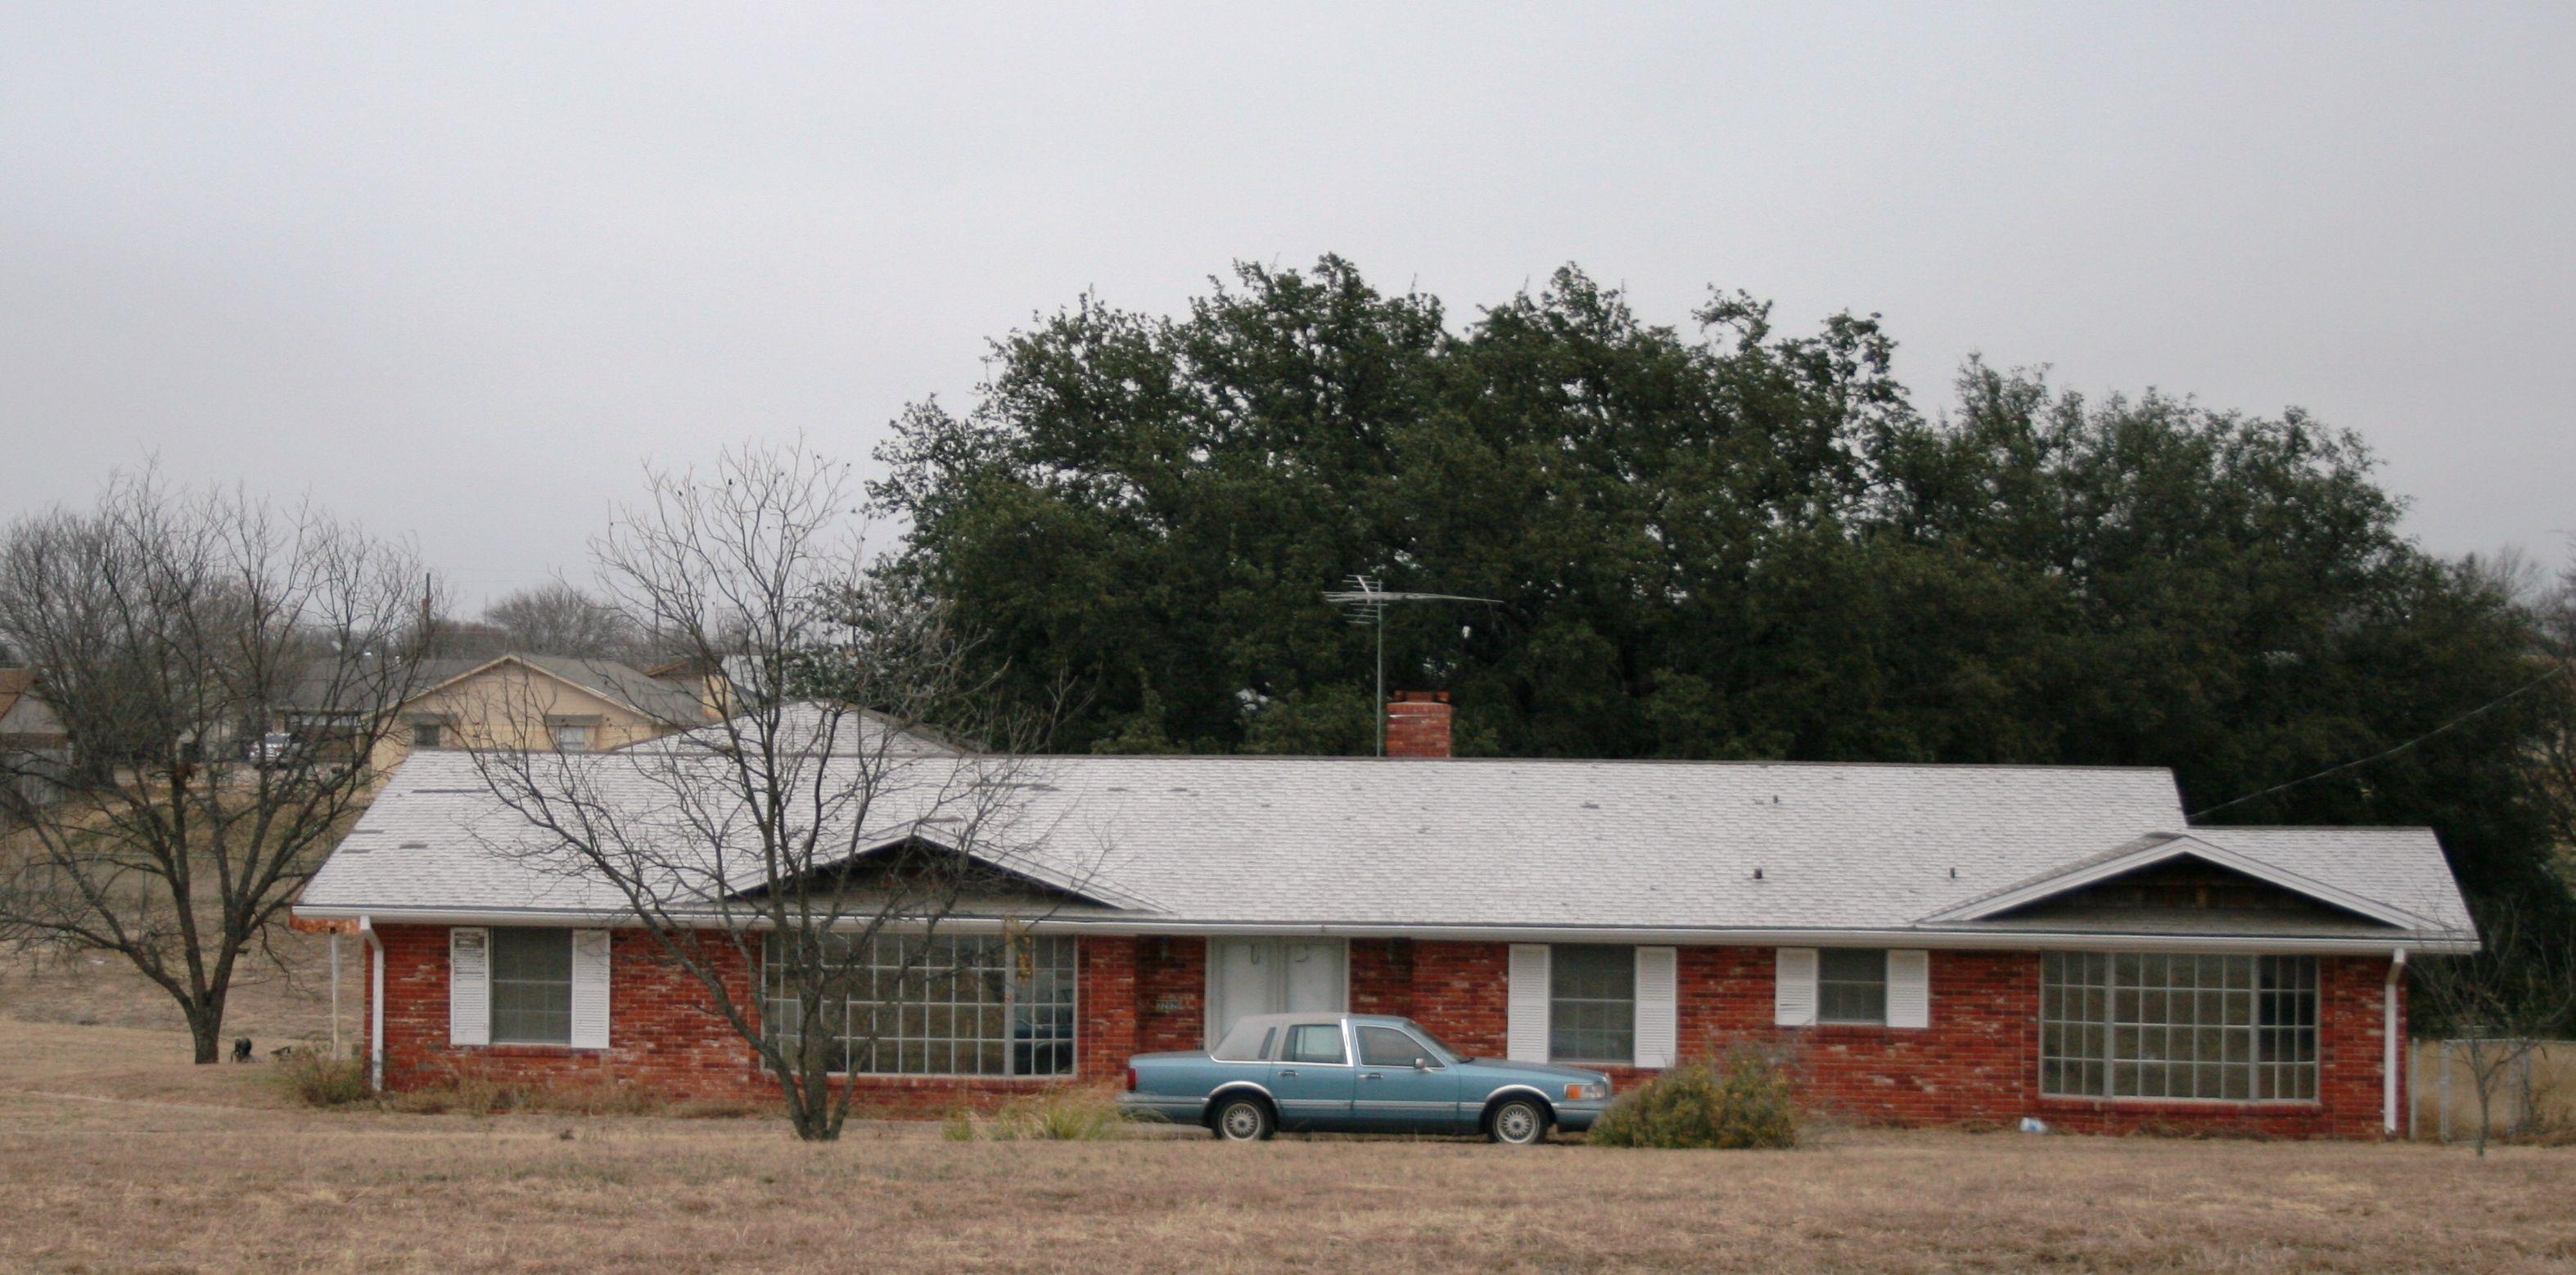 Home For Sale Killeen Texas 3100 Sf Home On 8 5 Acres In Killeen Texas Horses Ok 4 Bedroom 3 Bath 2 Living 2 D Killeen Texas Homes For Sale Texas Homes